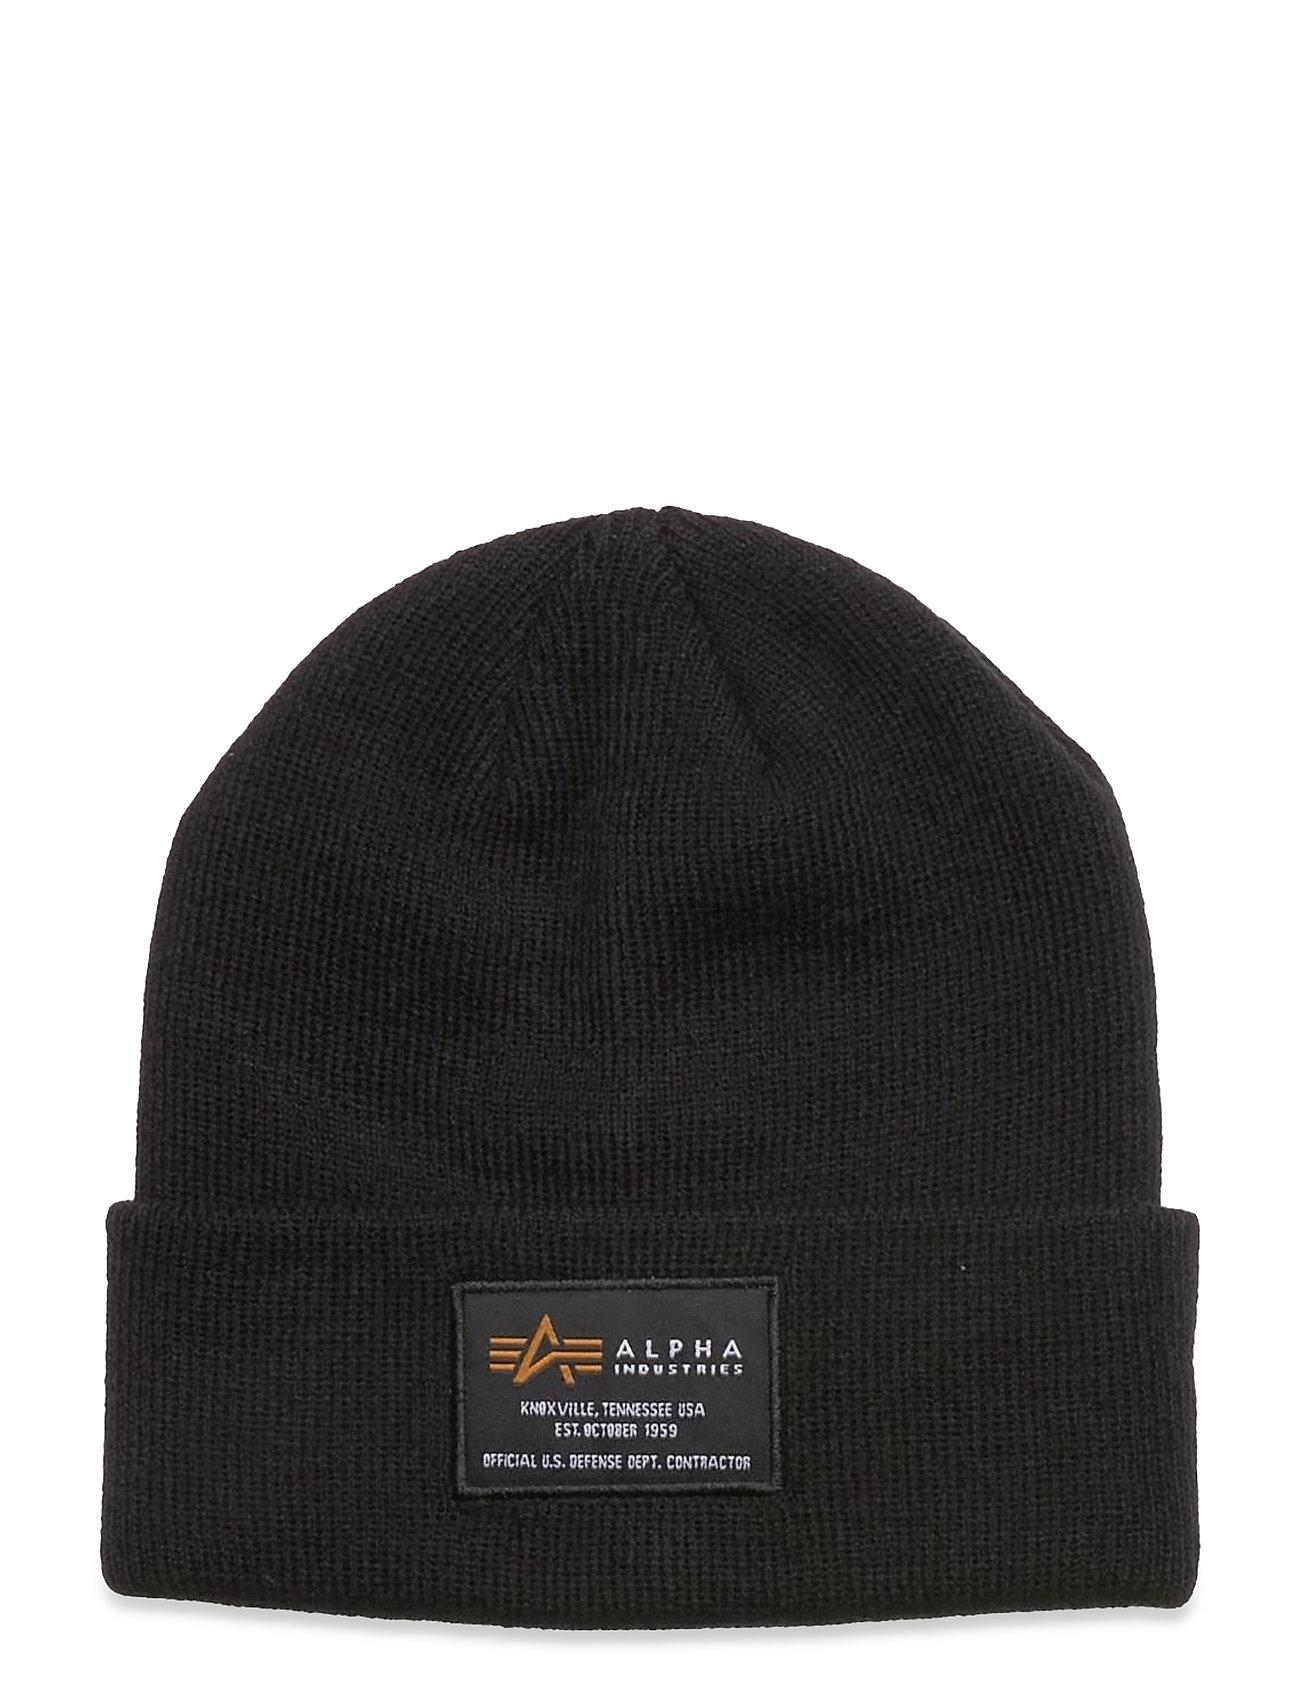 Crew Beanie Accessories Headwear Beanies Sort Alpha Industries